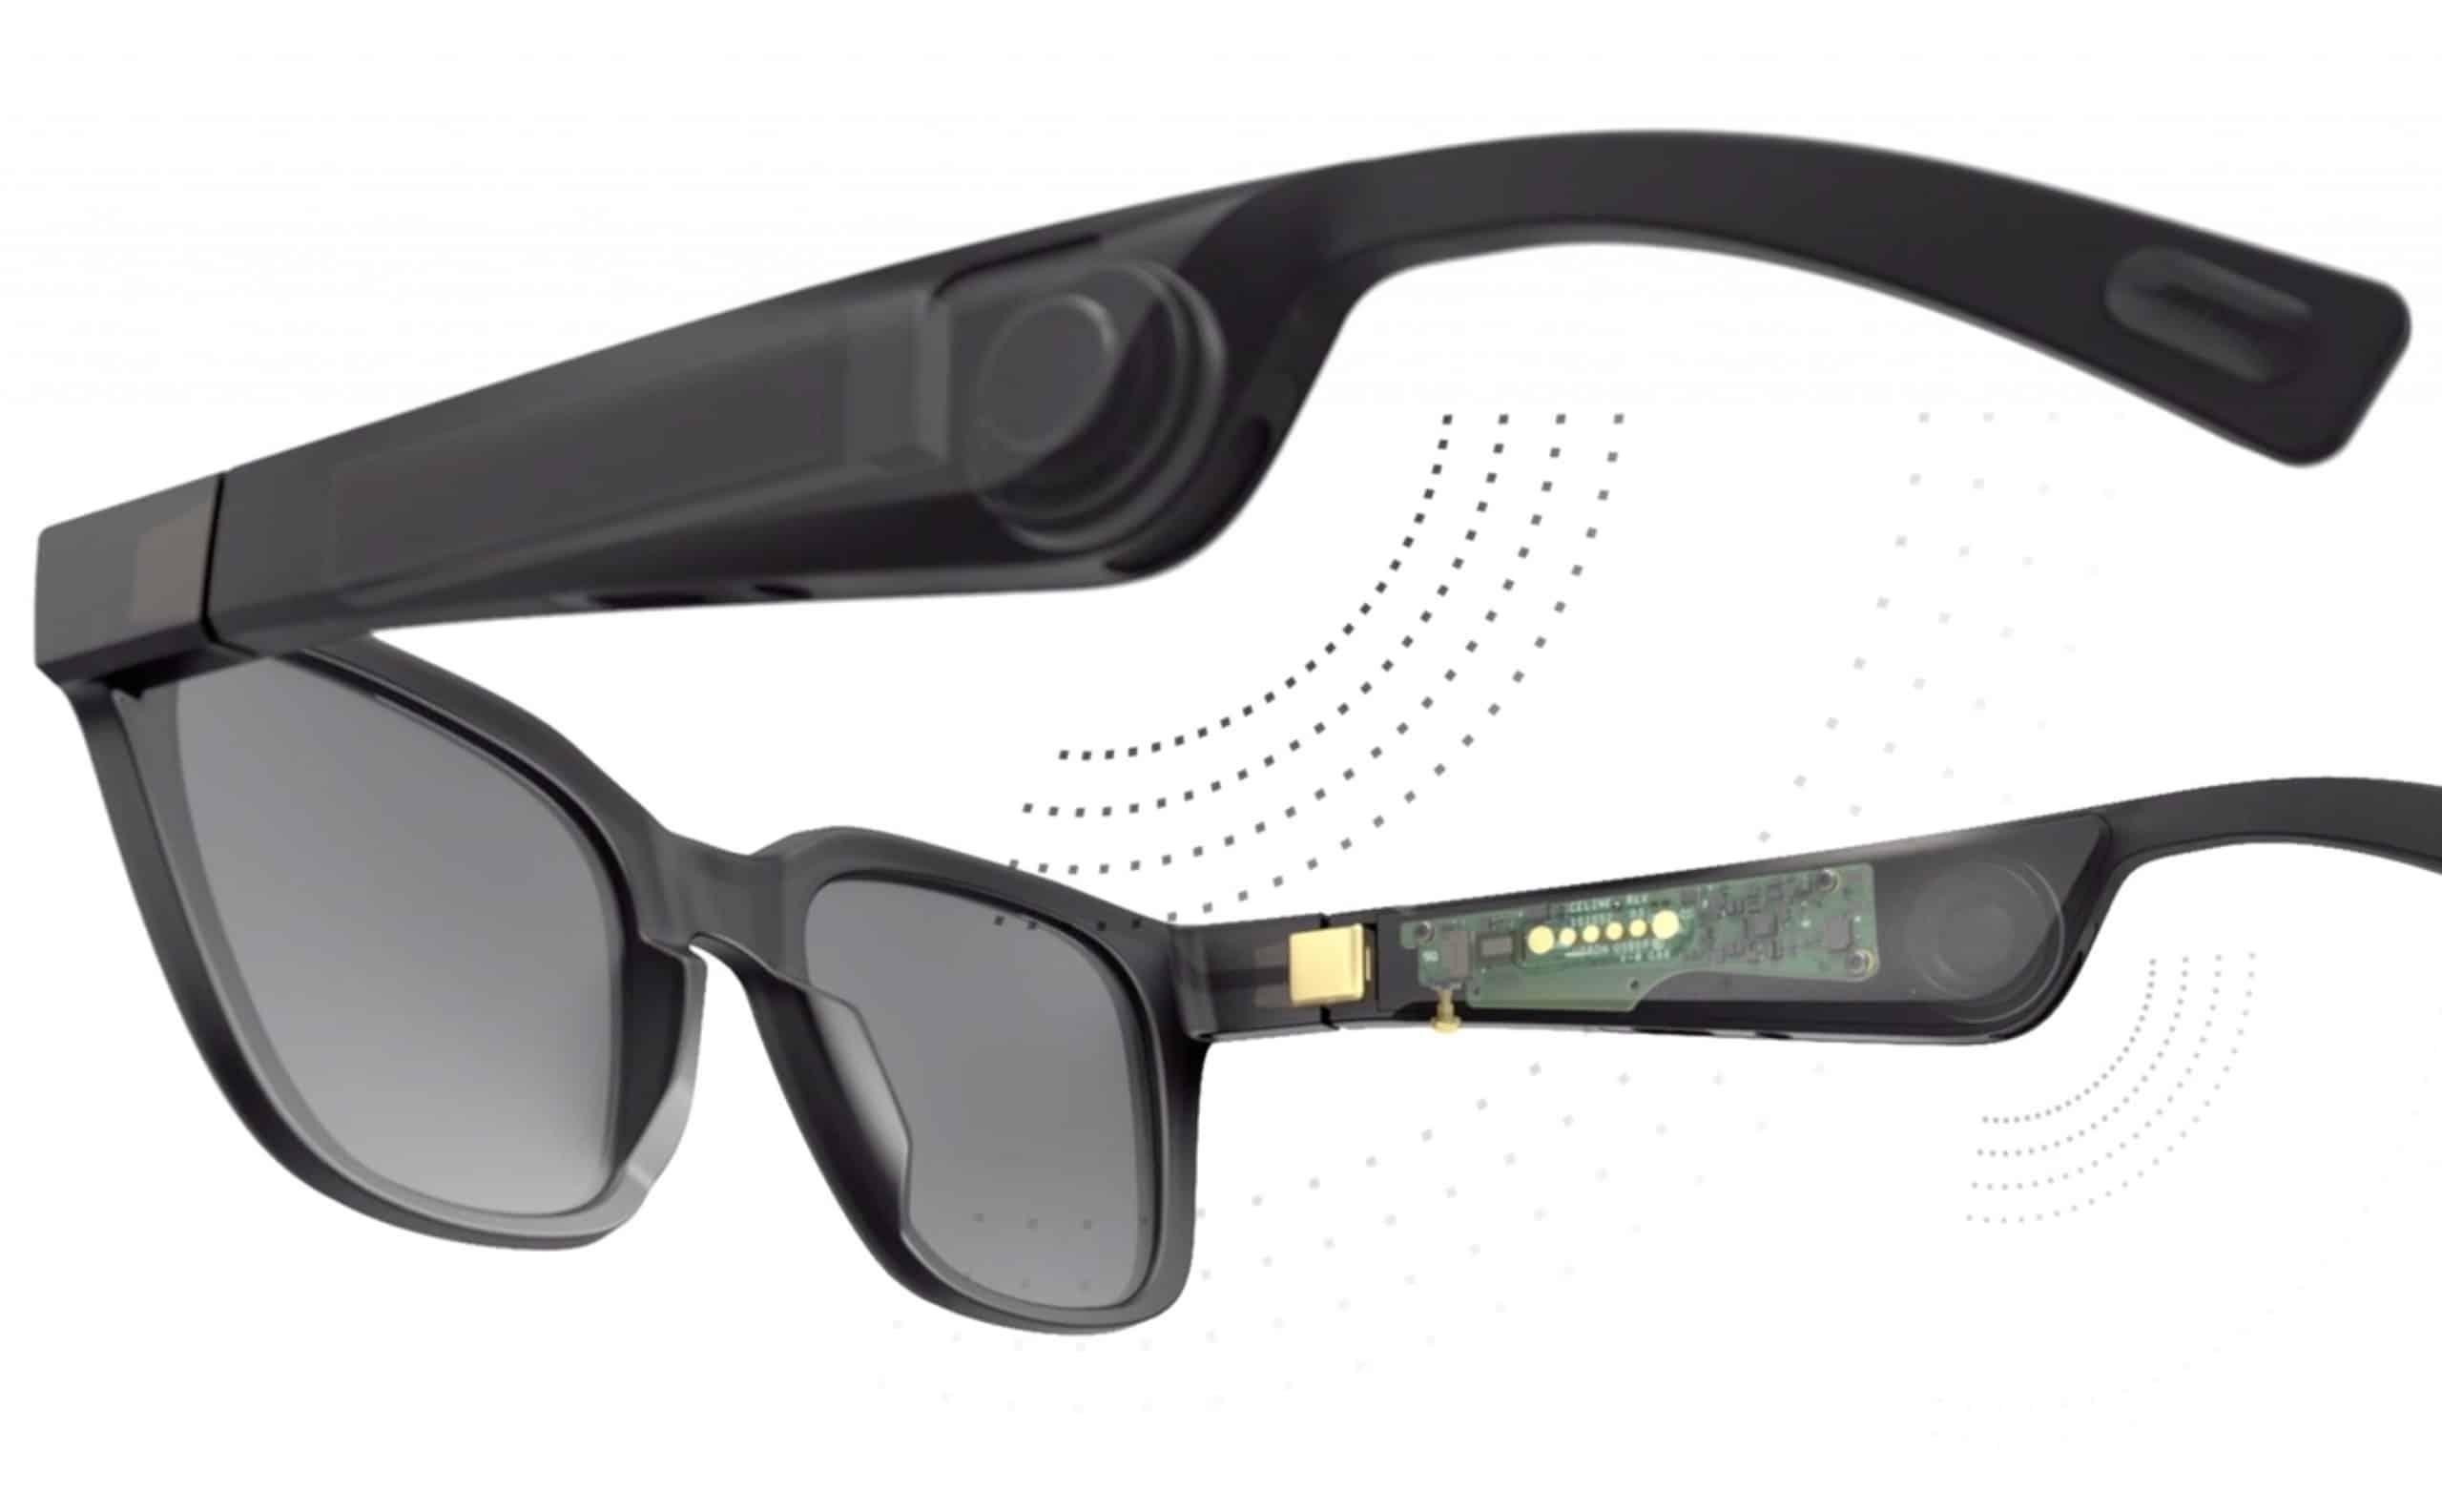 Bose Frames Audio Sunglasses 9